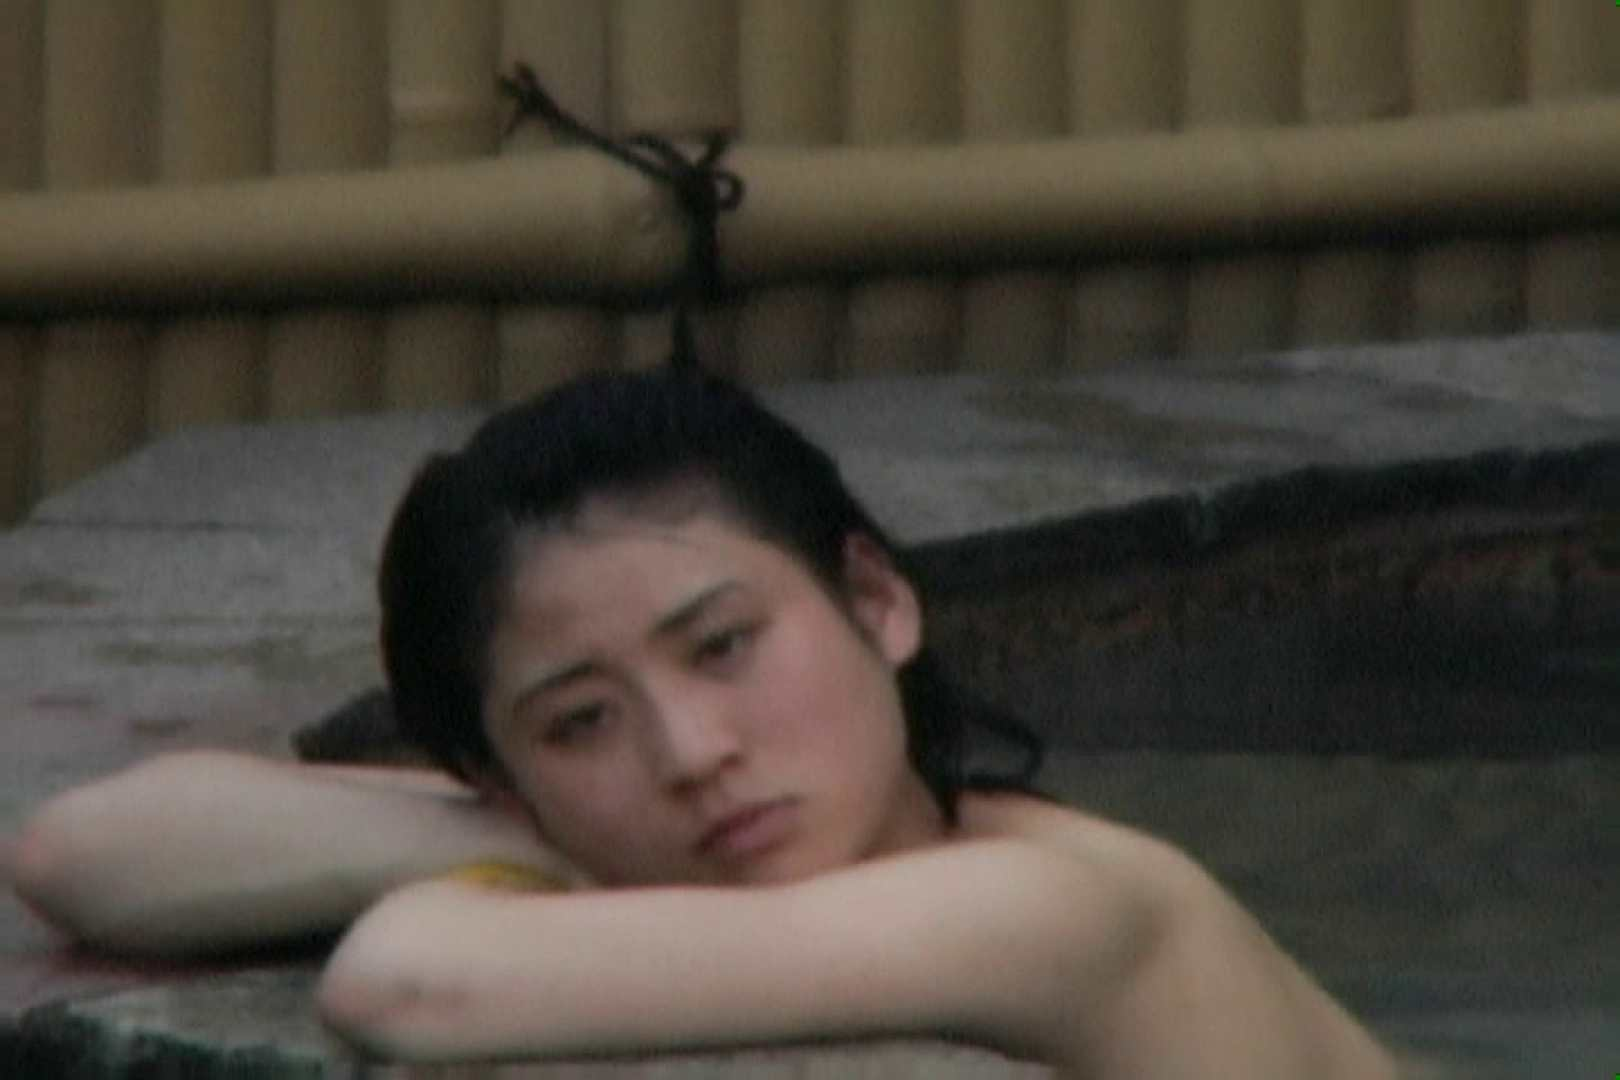 高画質露天女風呂観察 vol.004 望遠映像 すけべAV動画紹介 99PIX 95